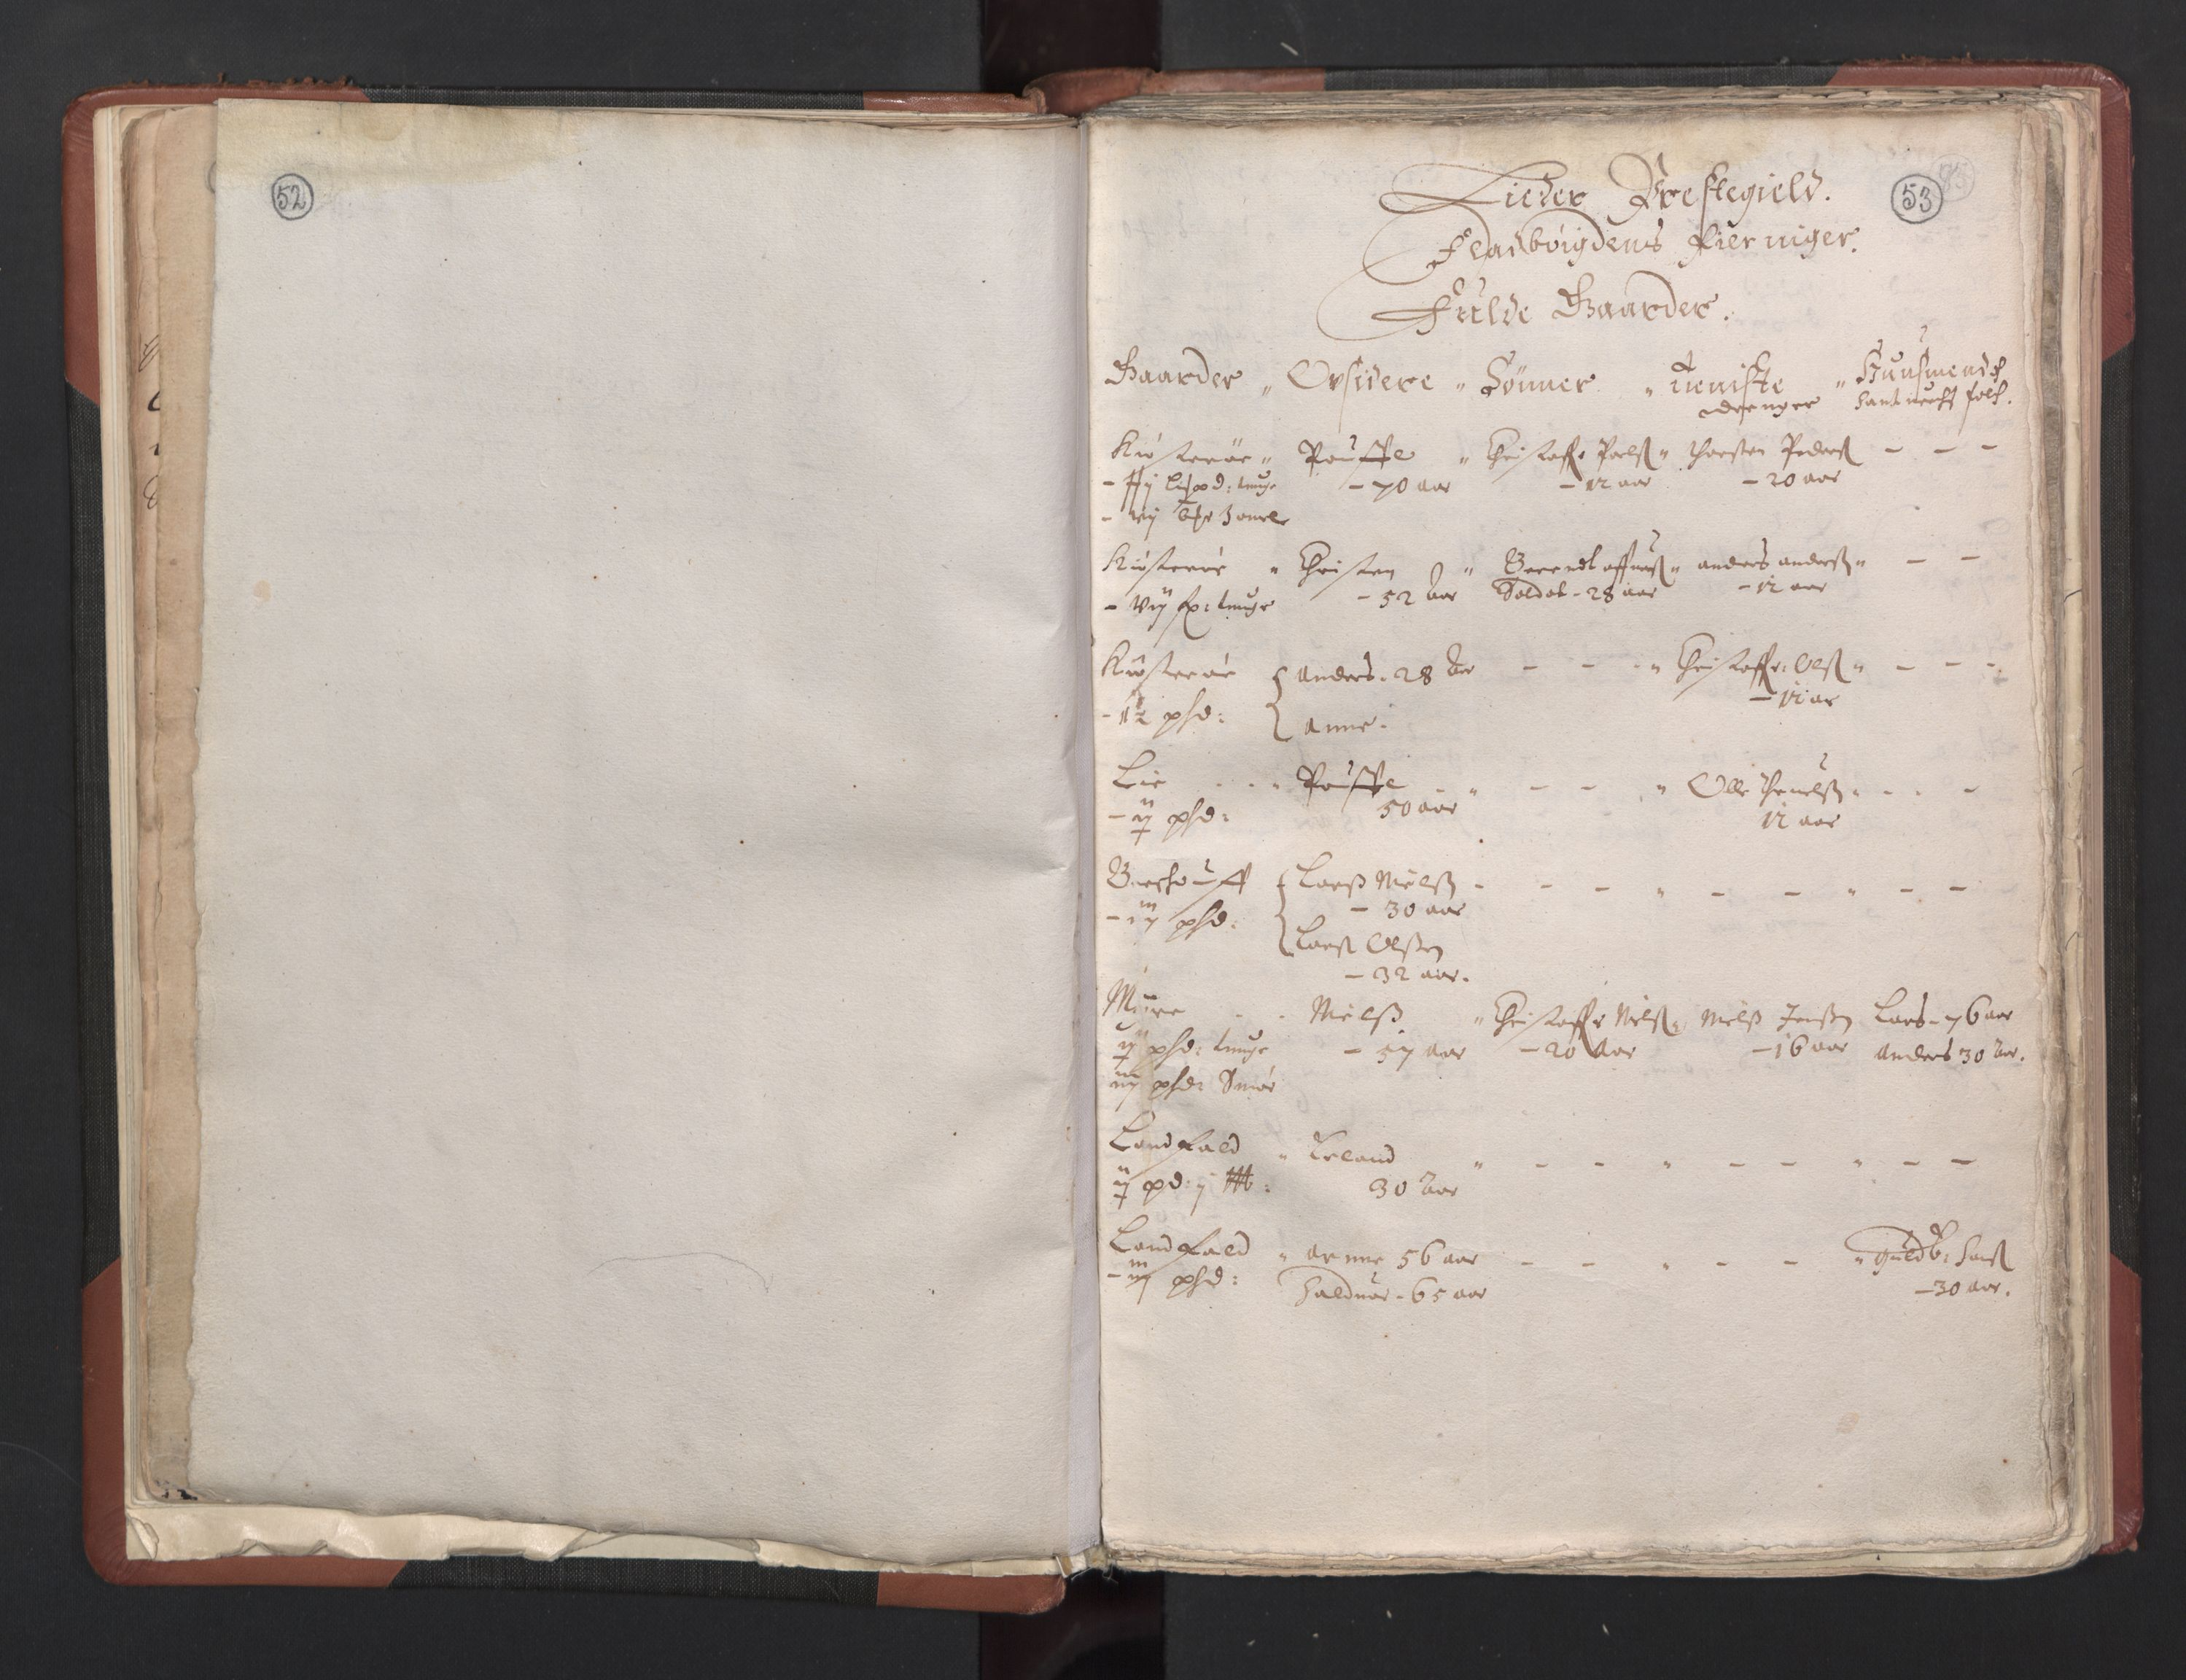 RA, Fogdenes og sorenskrivernes manntall 1664-1666, nr. 5: Fogderier (len og skipreider) i nåværende Buskerud fylke og Vestfold fylke, 1664, s. 52-53